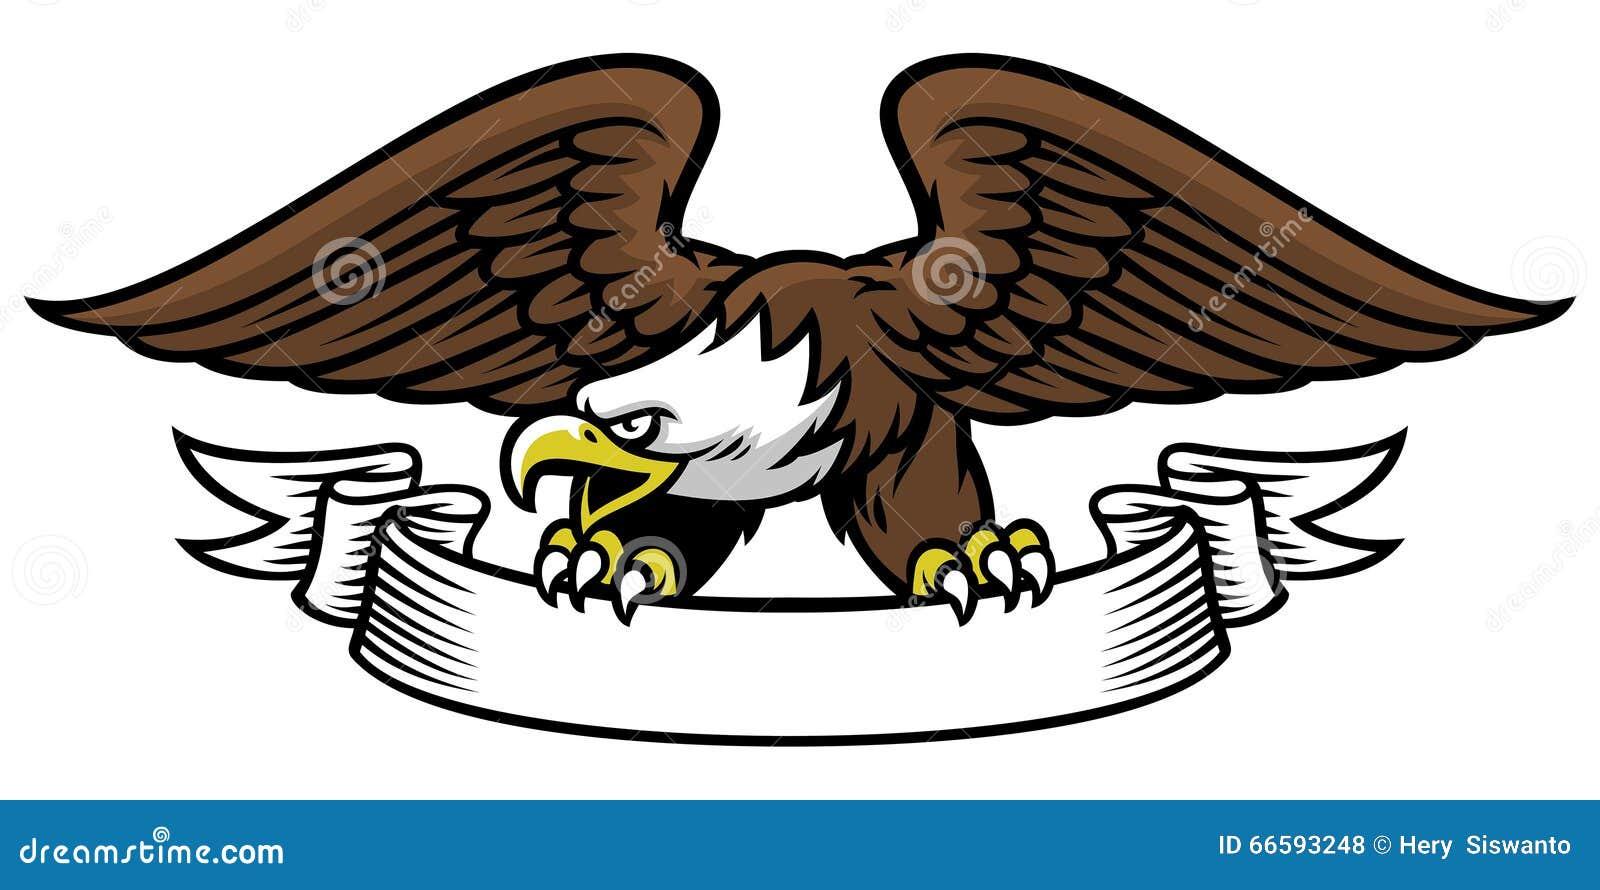 Eagle mascot grip the ribbon